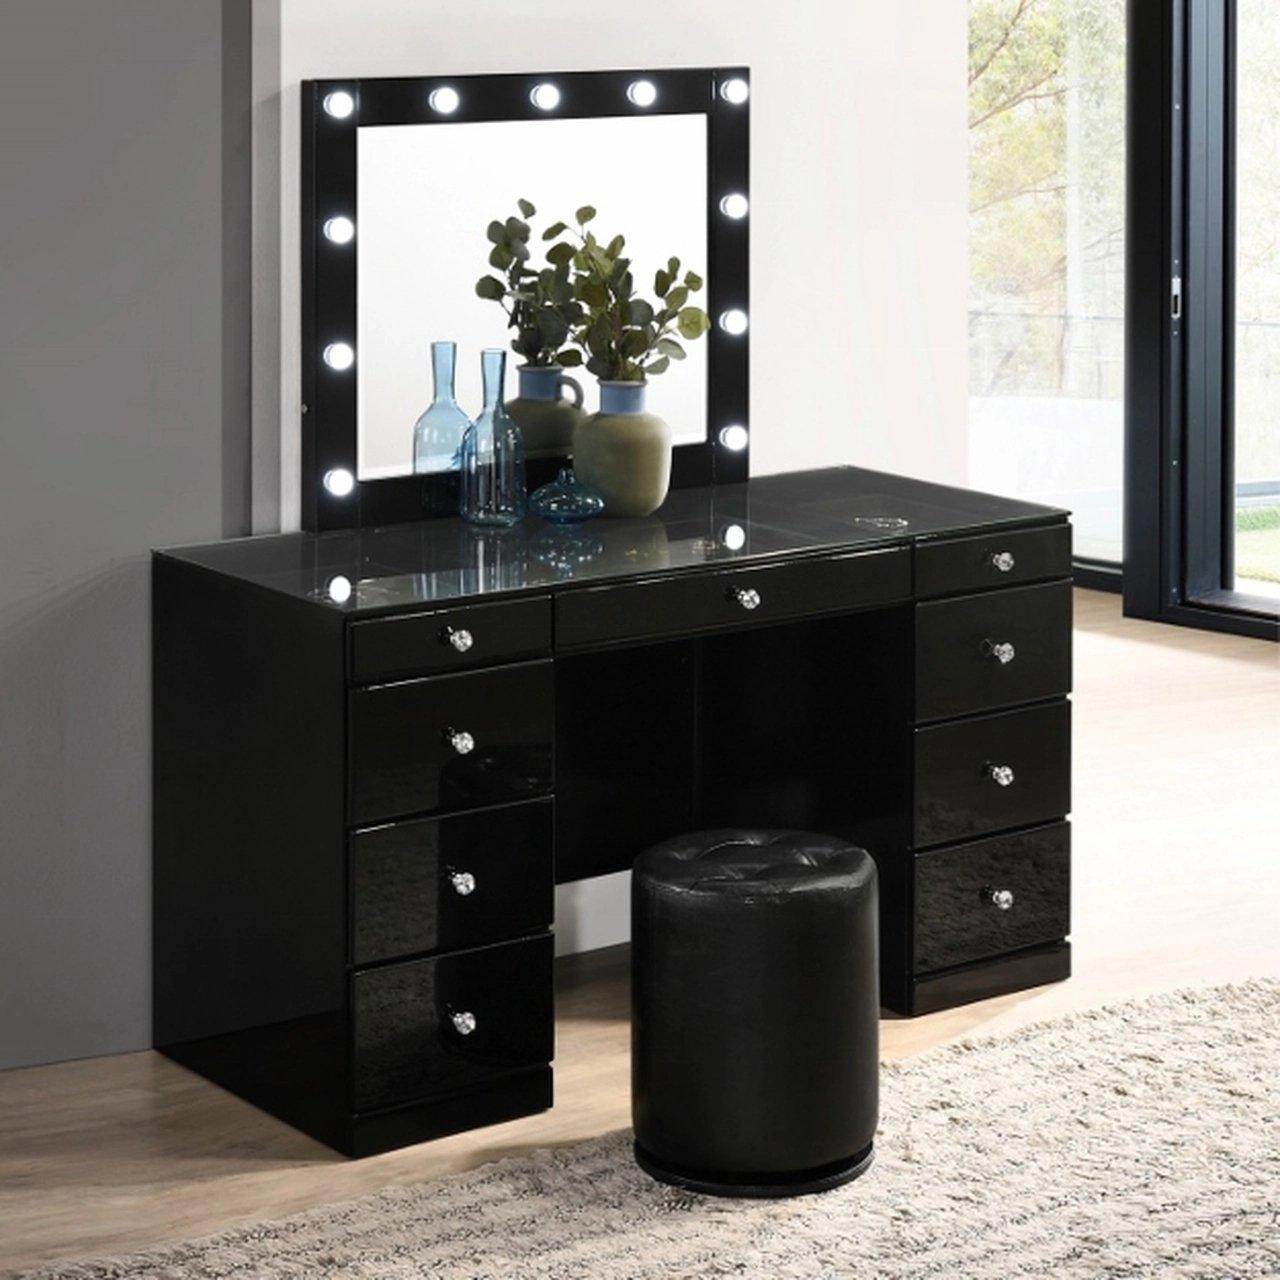 B4850BKSET Avery  Vanity Desk Set Black